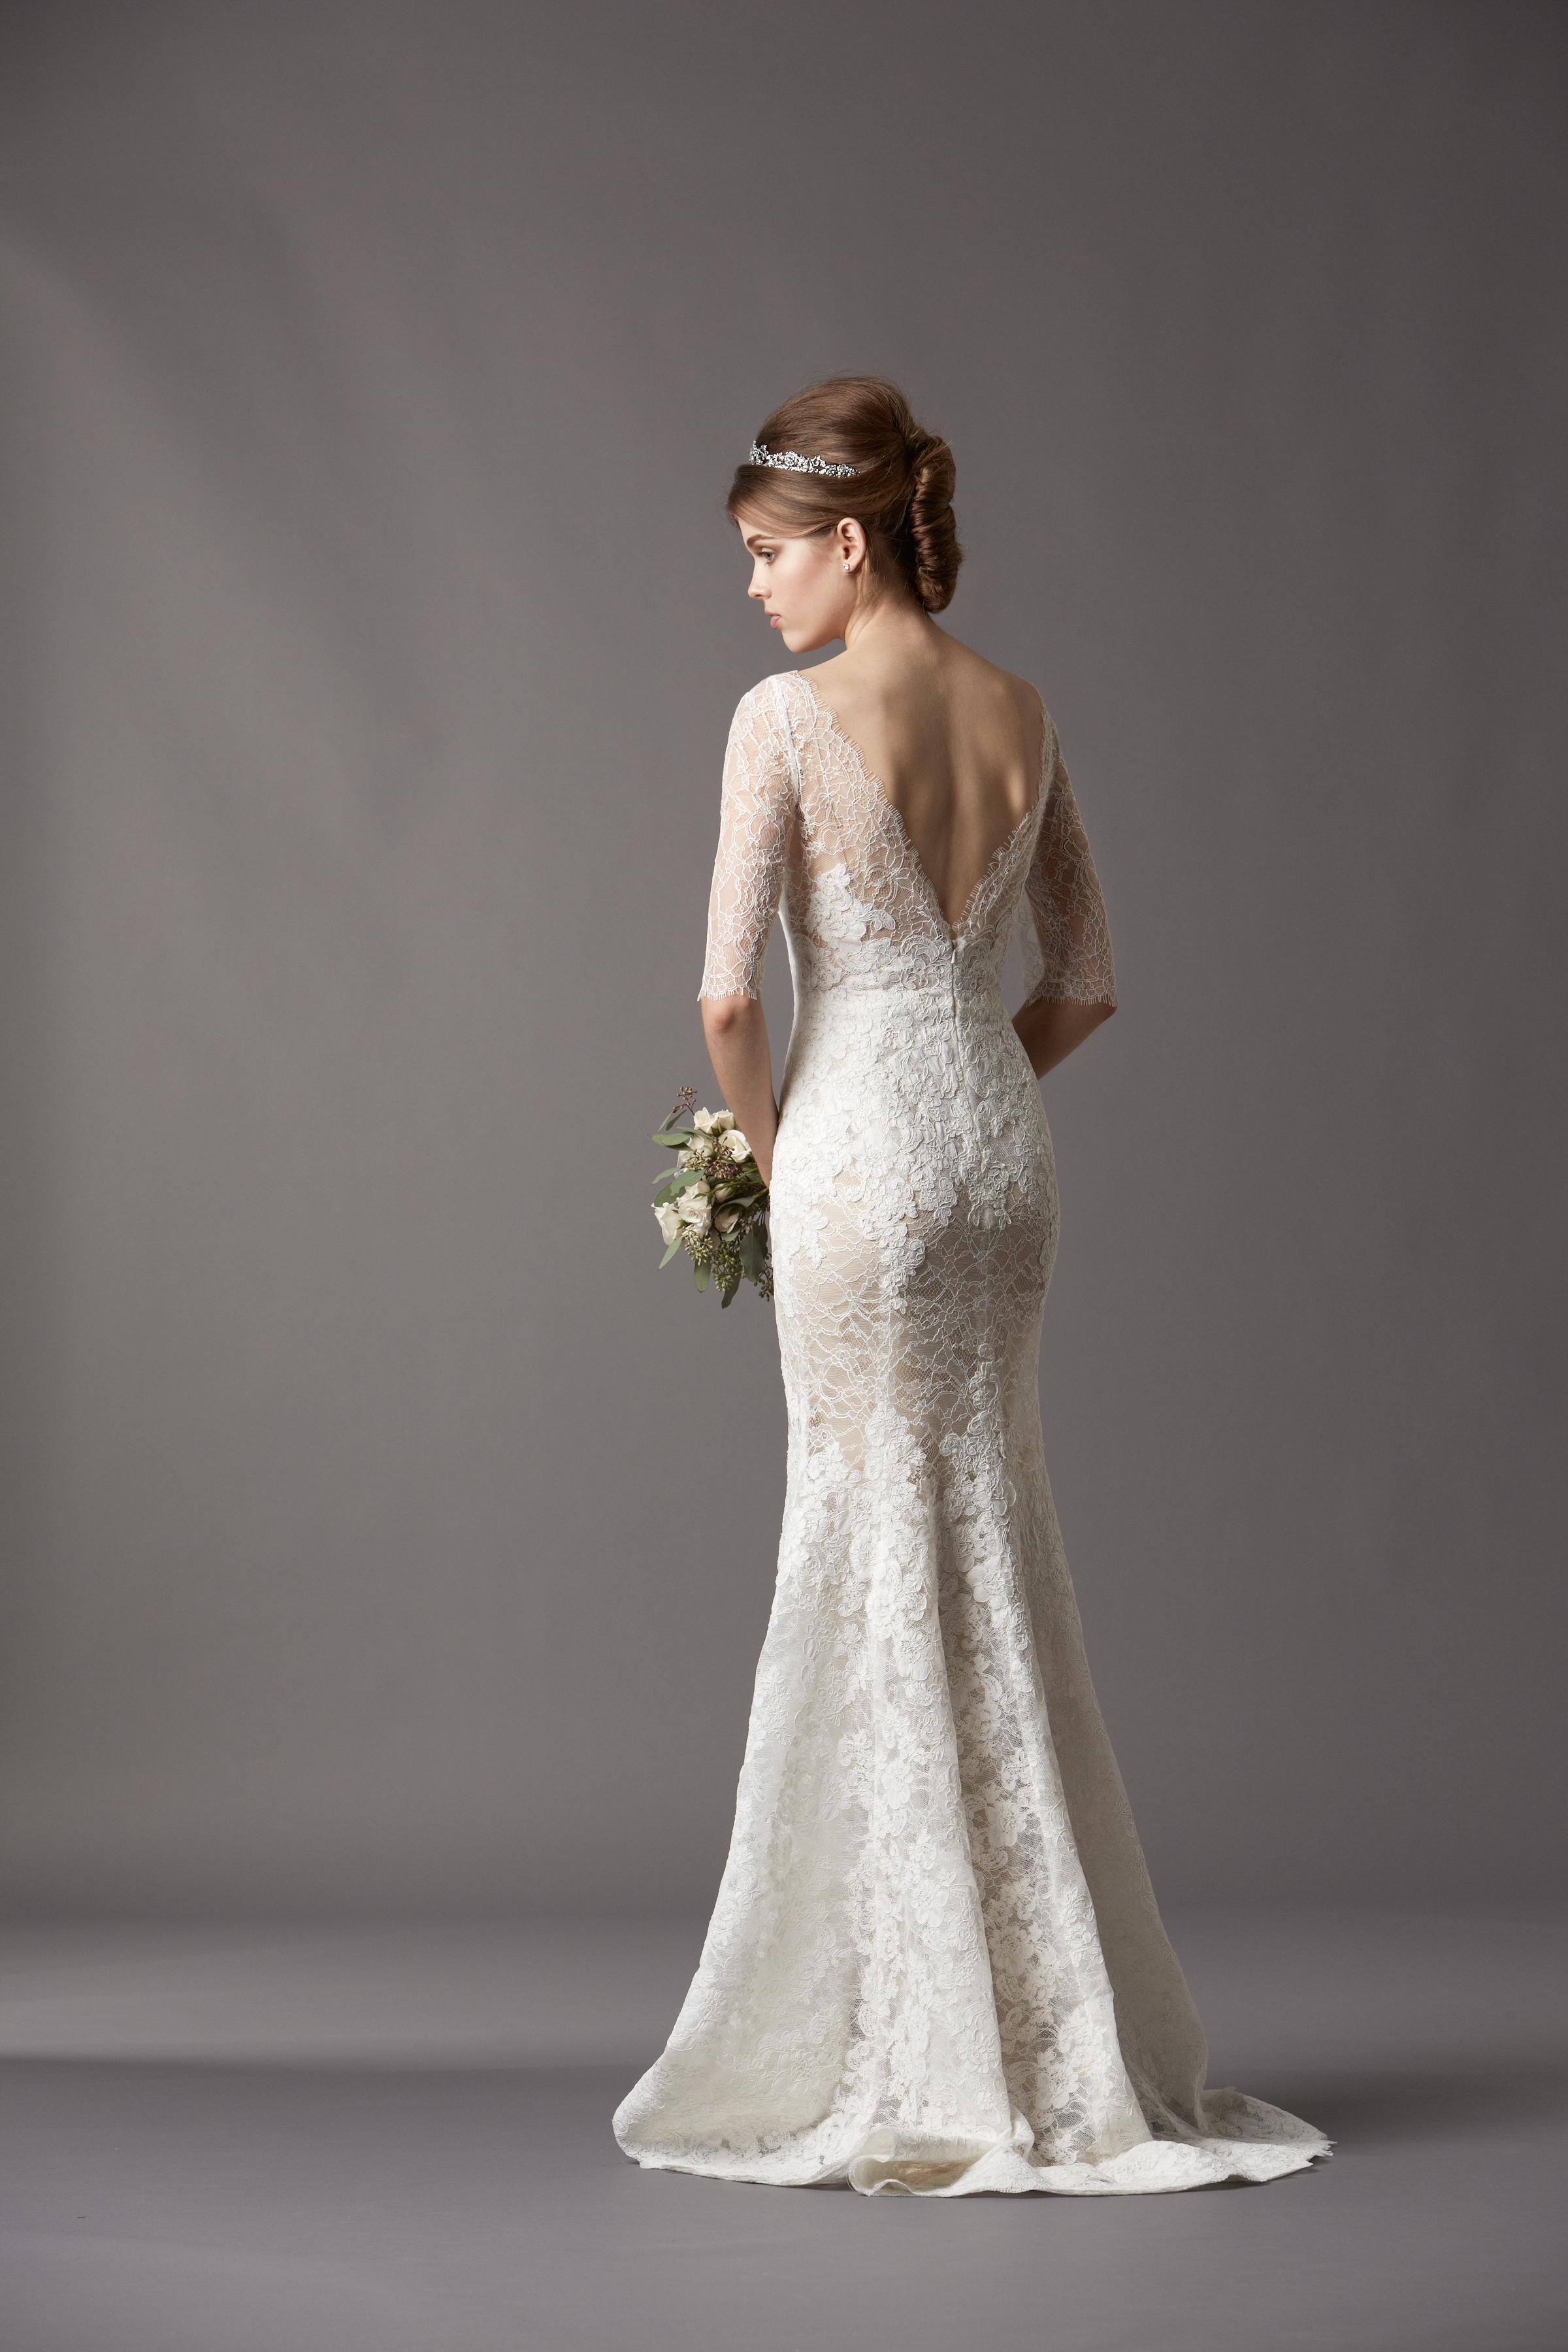 Watters bridal gowns fall 2013 wedding dress 4096b for Watters wtoo wedding dresses